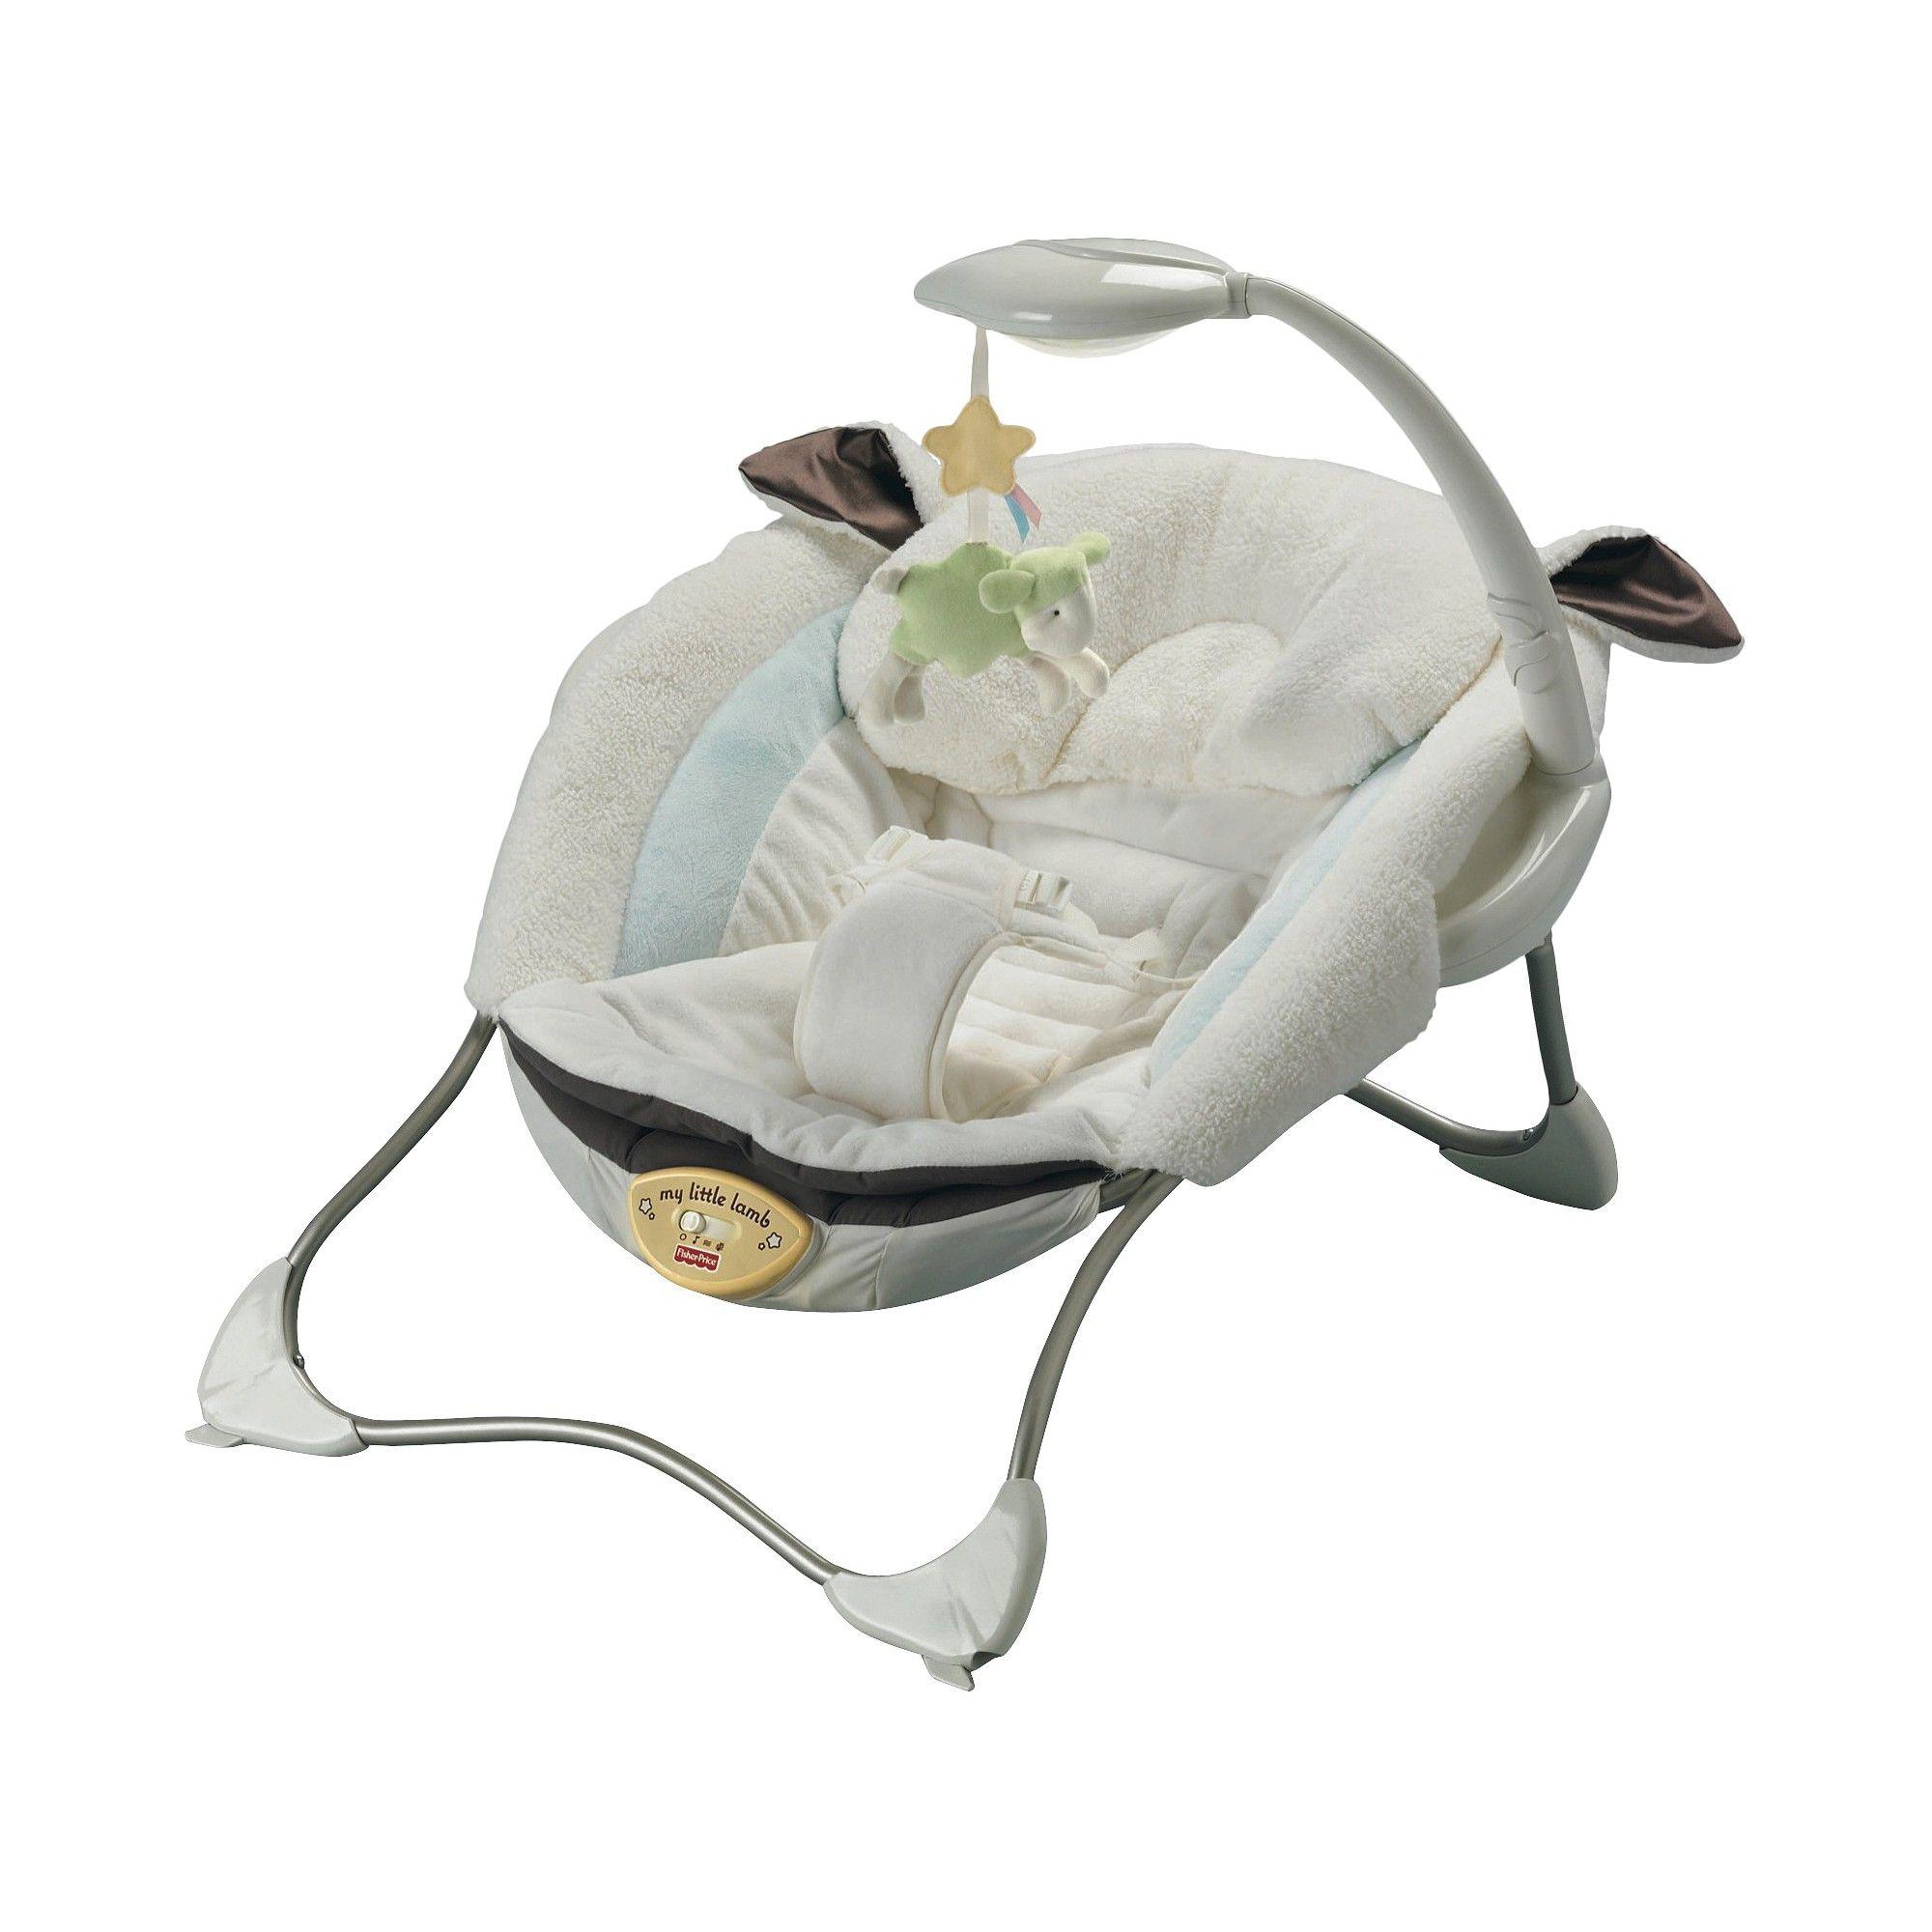 FisherPrice My Little Lamb Infant Seat, White Baby